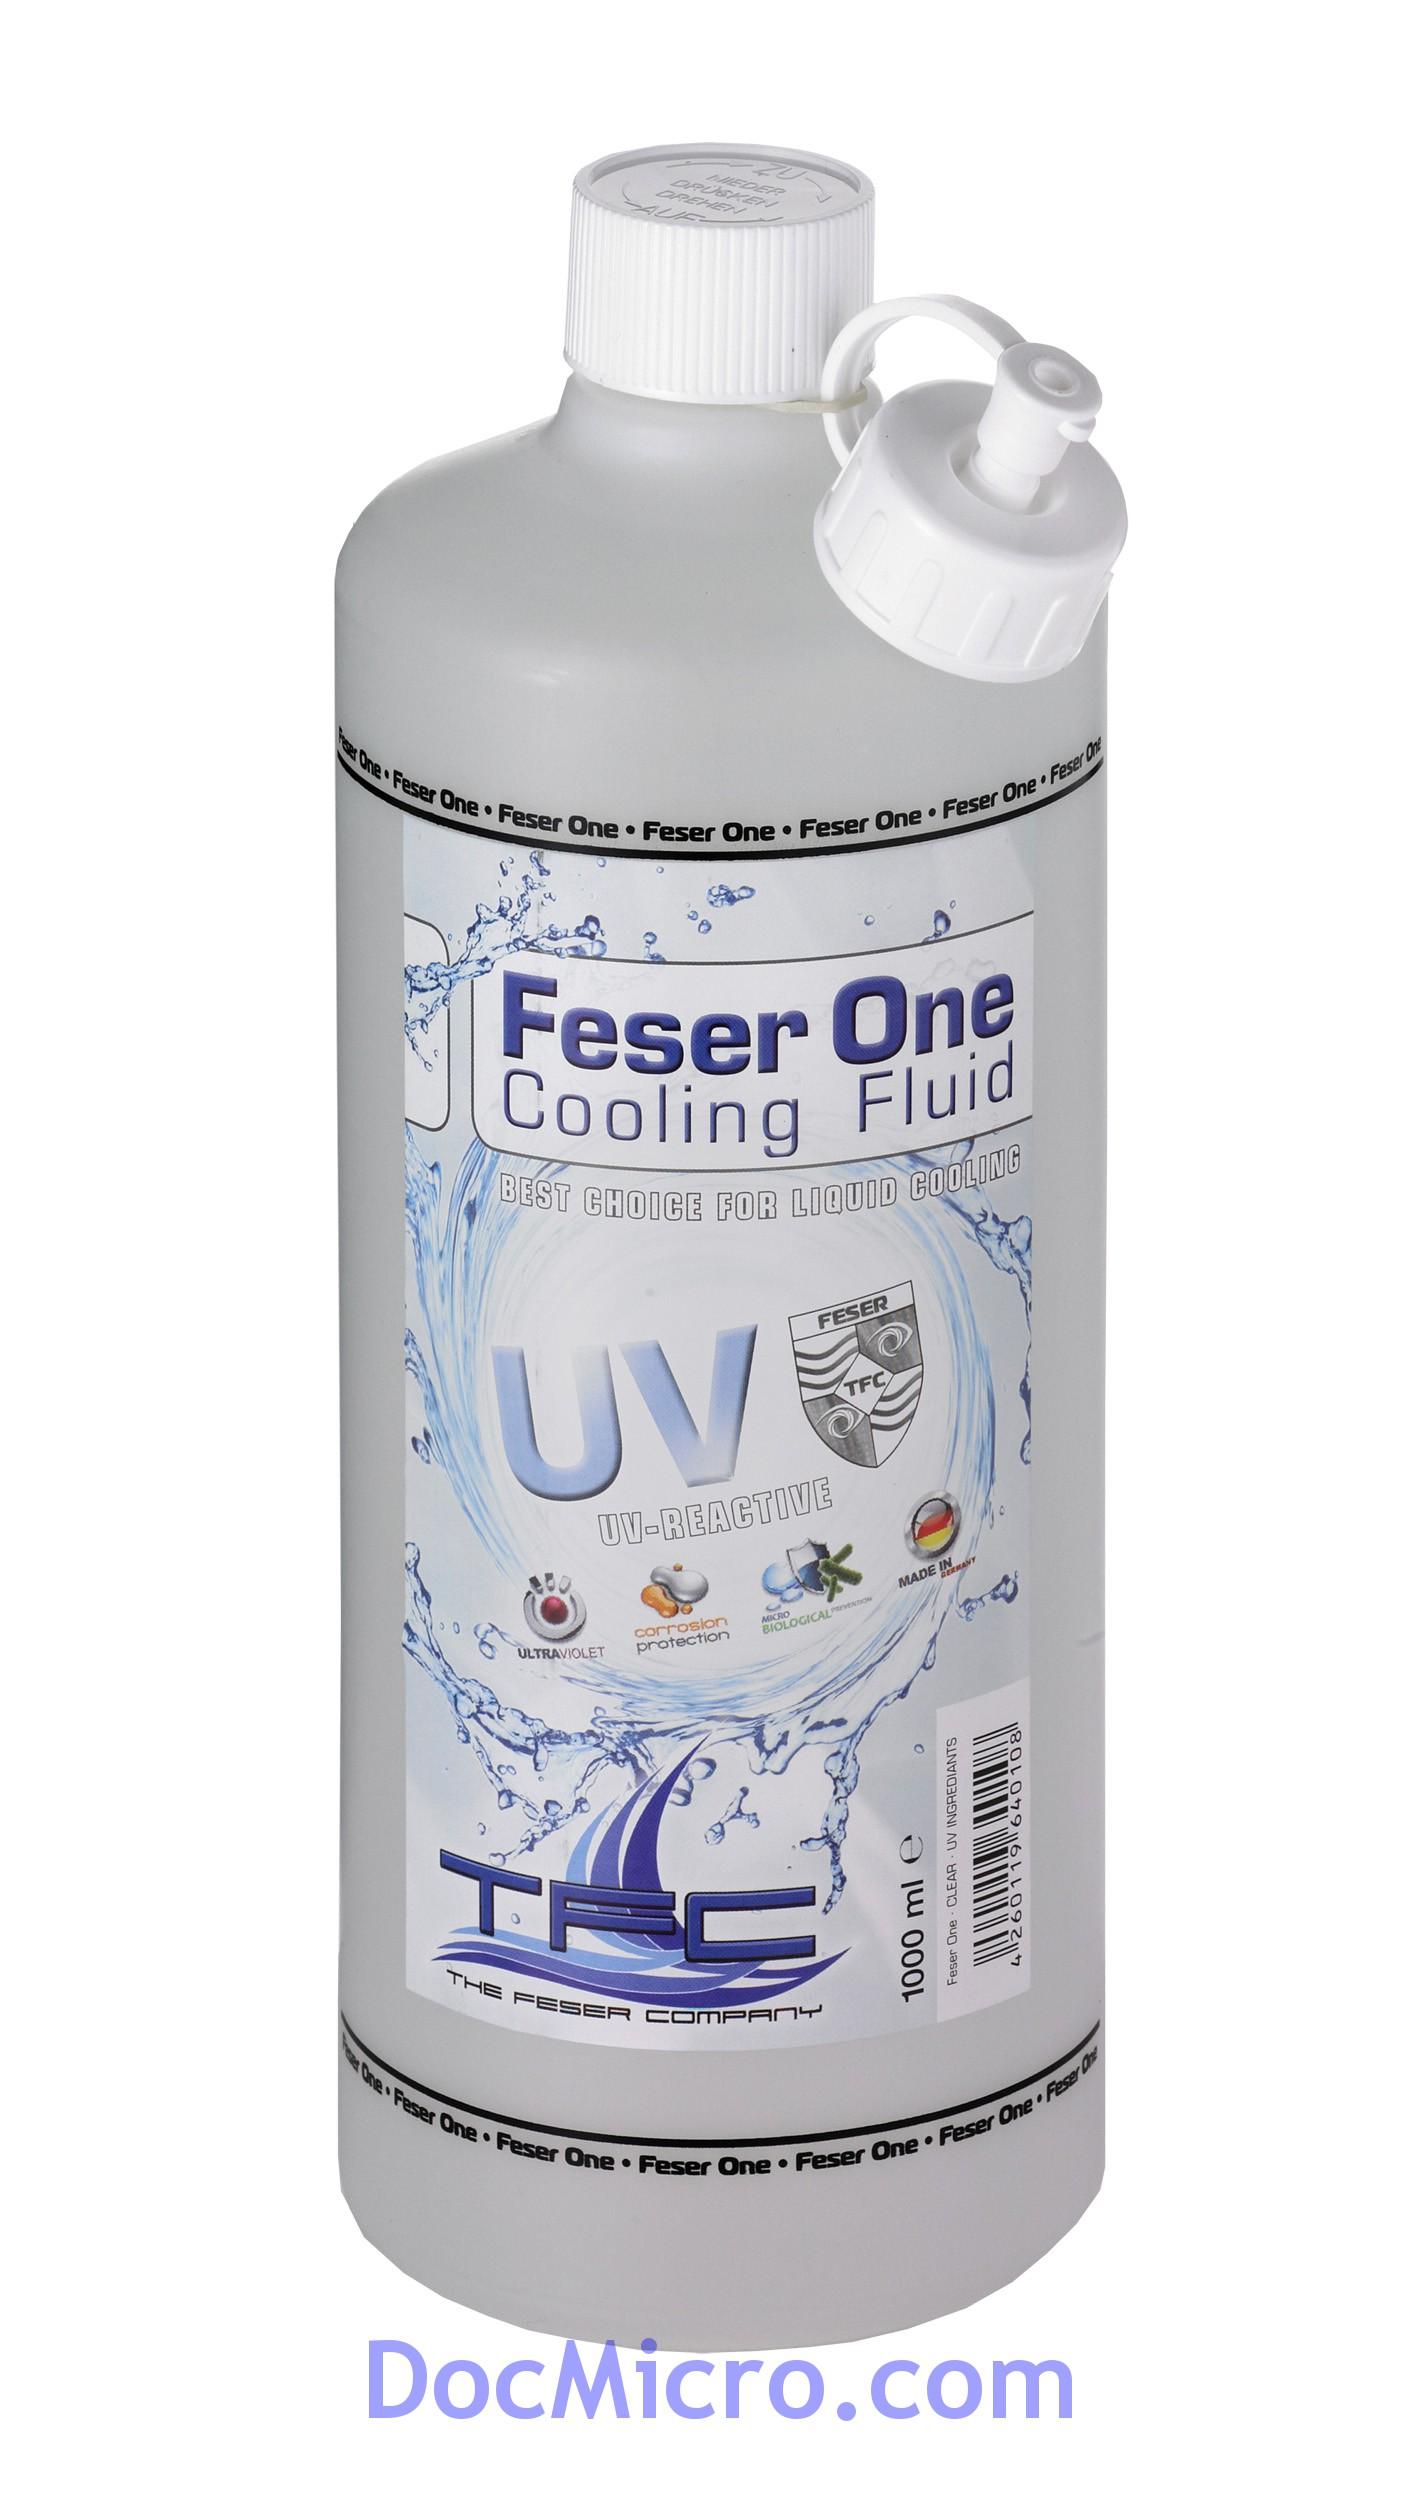 liquide de protection feser one cooling fluid r actif aux uv transparent bleu 1 litre the. Black Bedroom Furniture Sets. Home Design Ideas